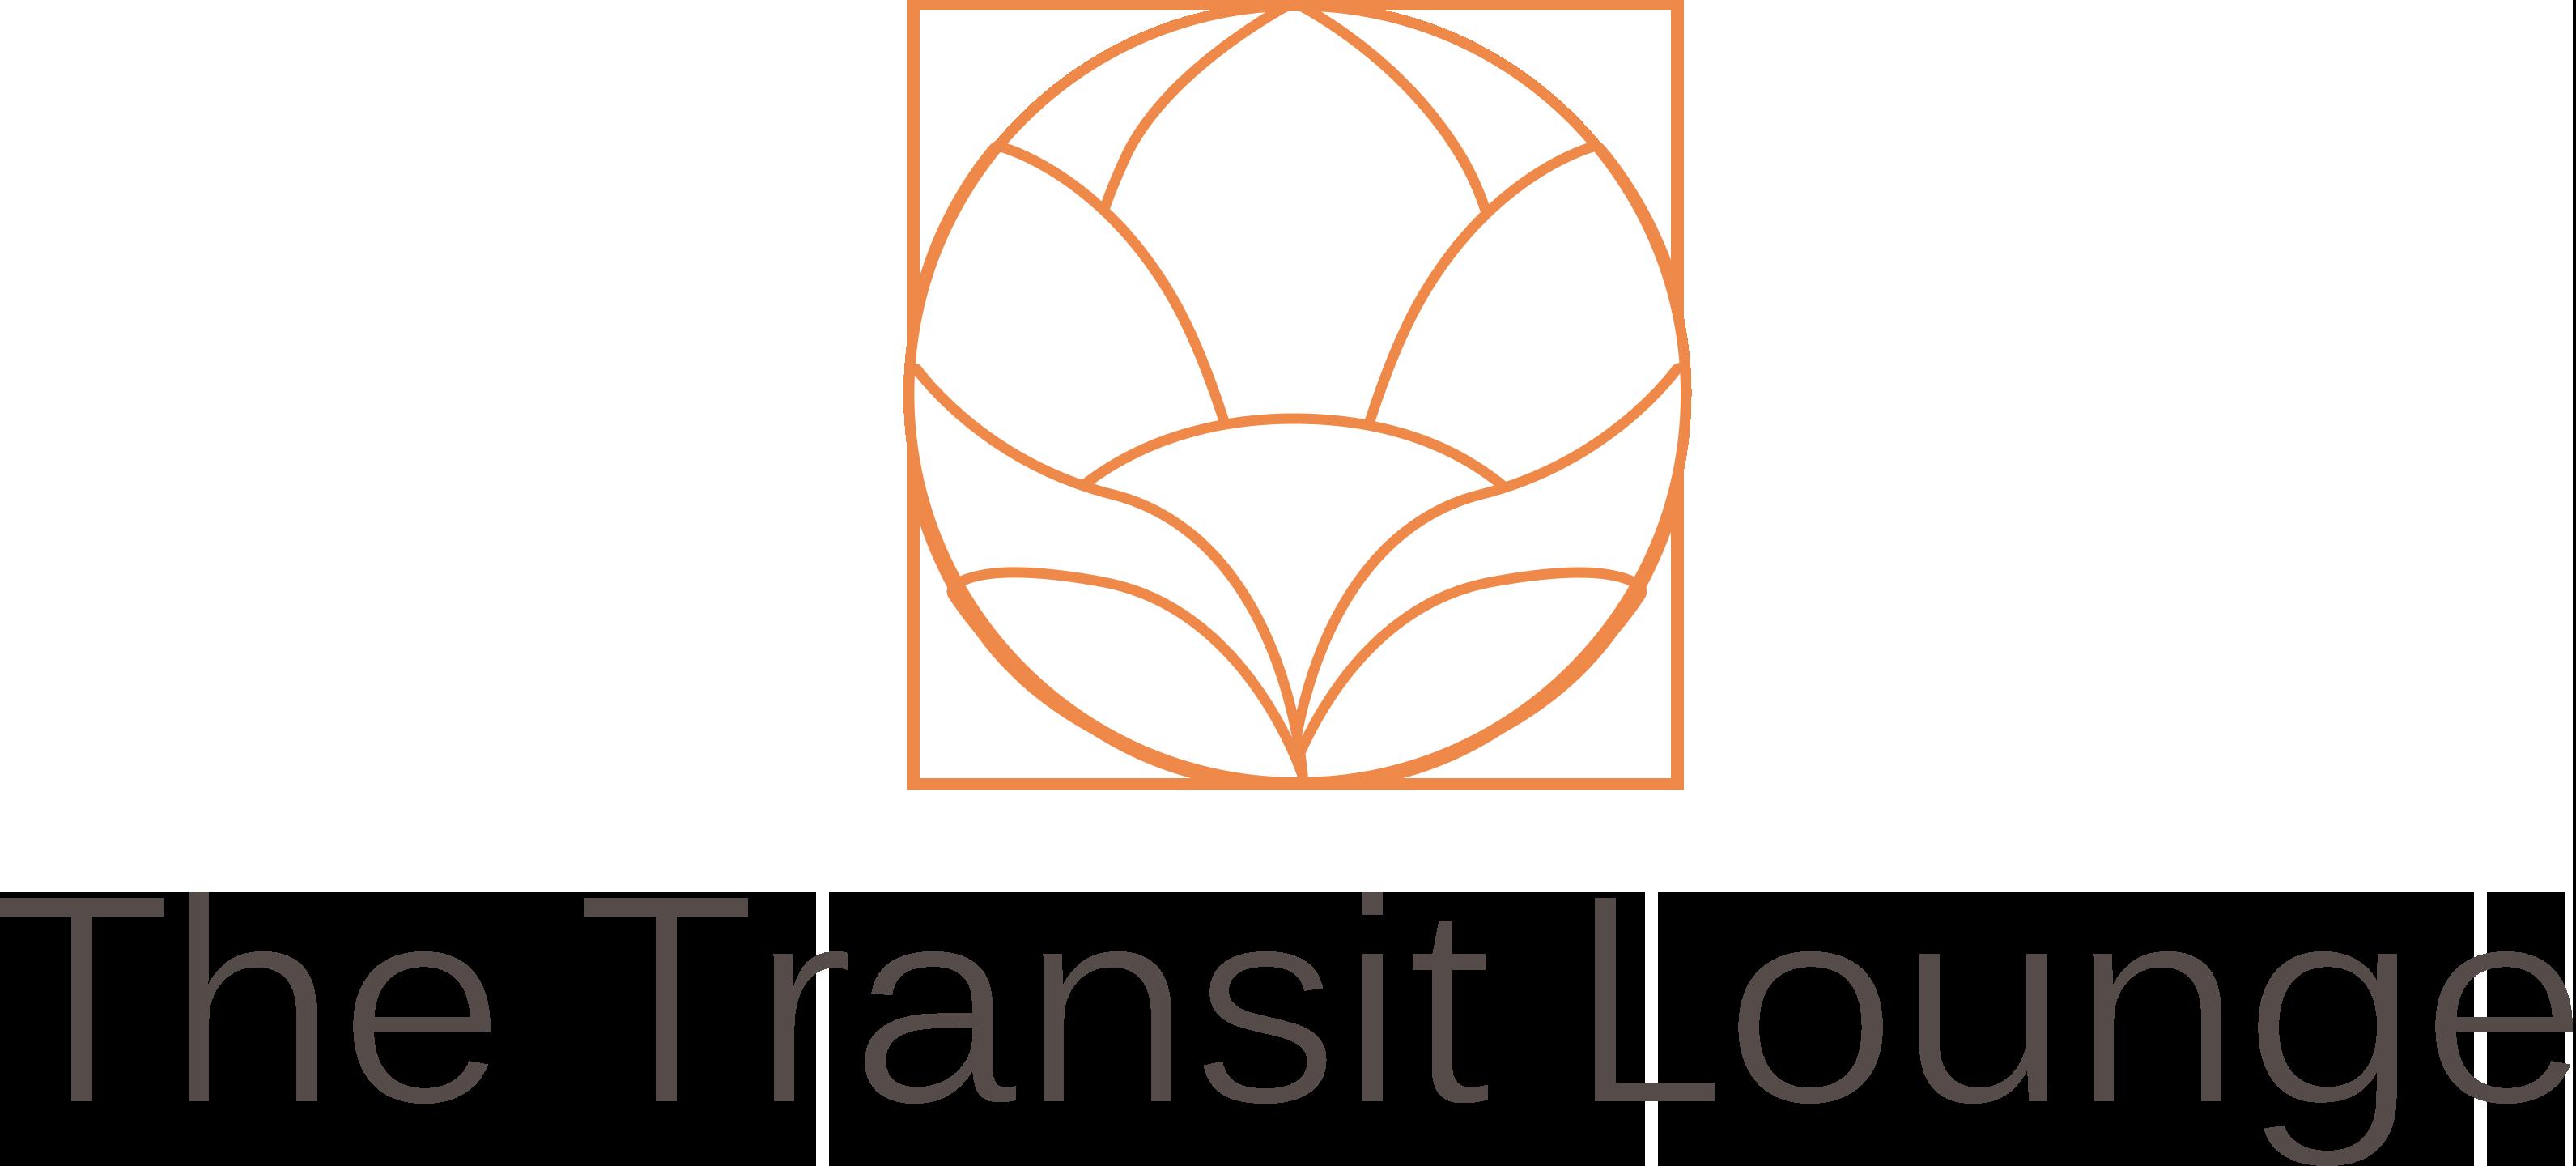 https://nicholstark.com.au/wp-content/uploads/2021/04/Nichol-Stark-Business-Coaching-The-Transit-Lounge.png